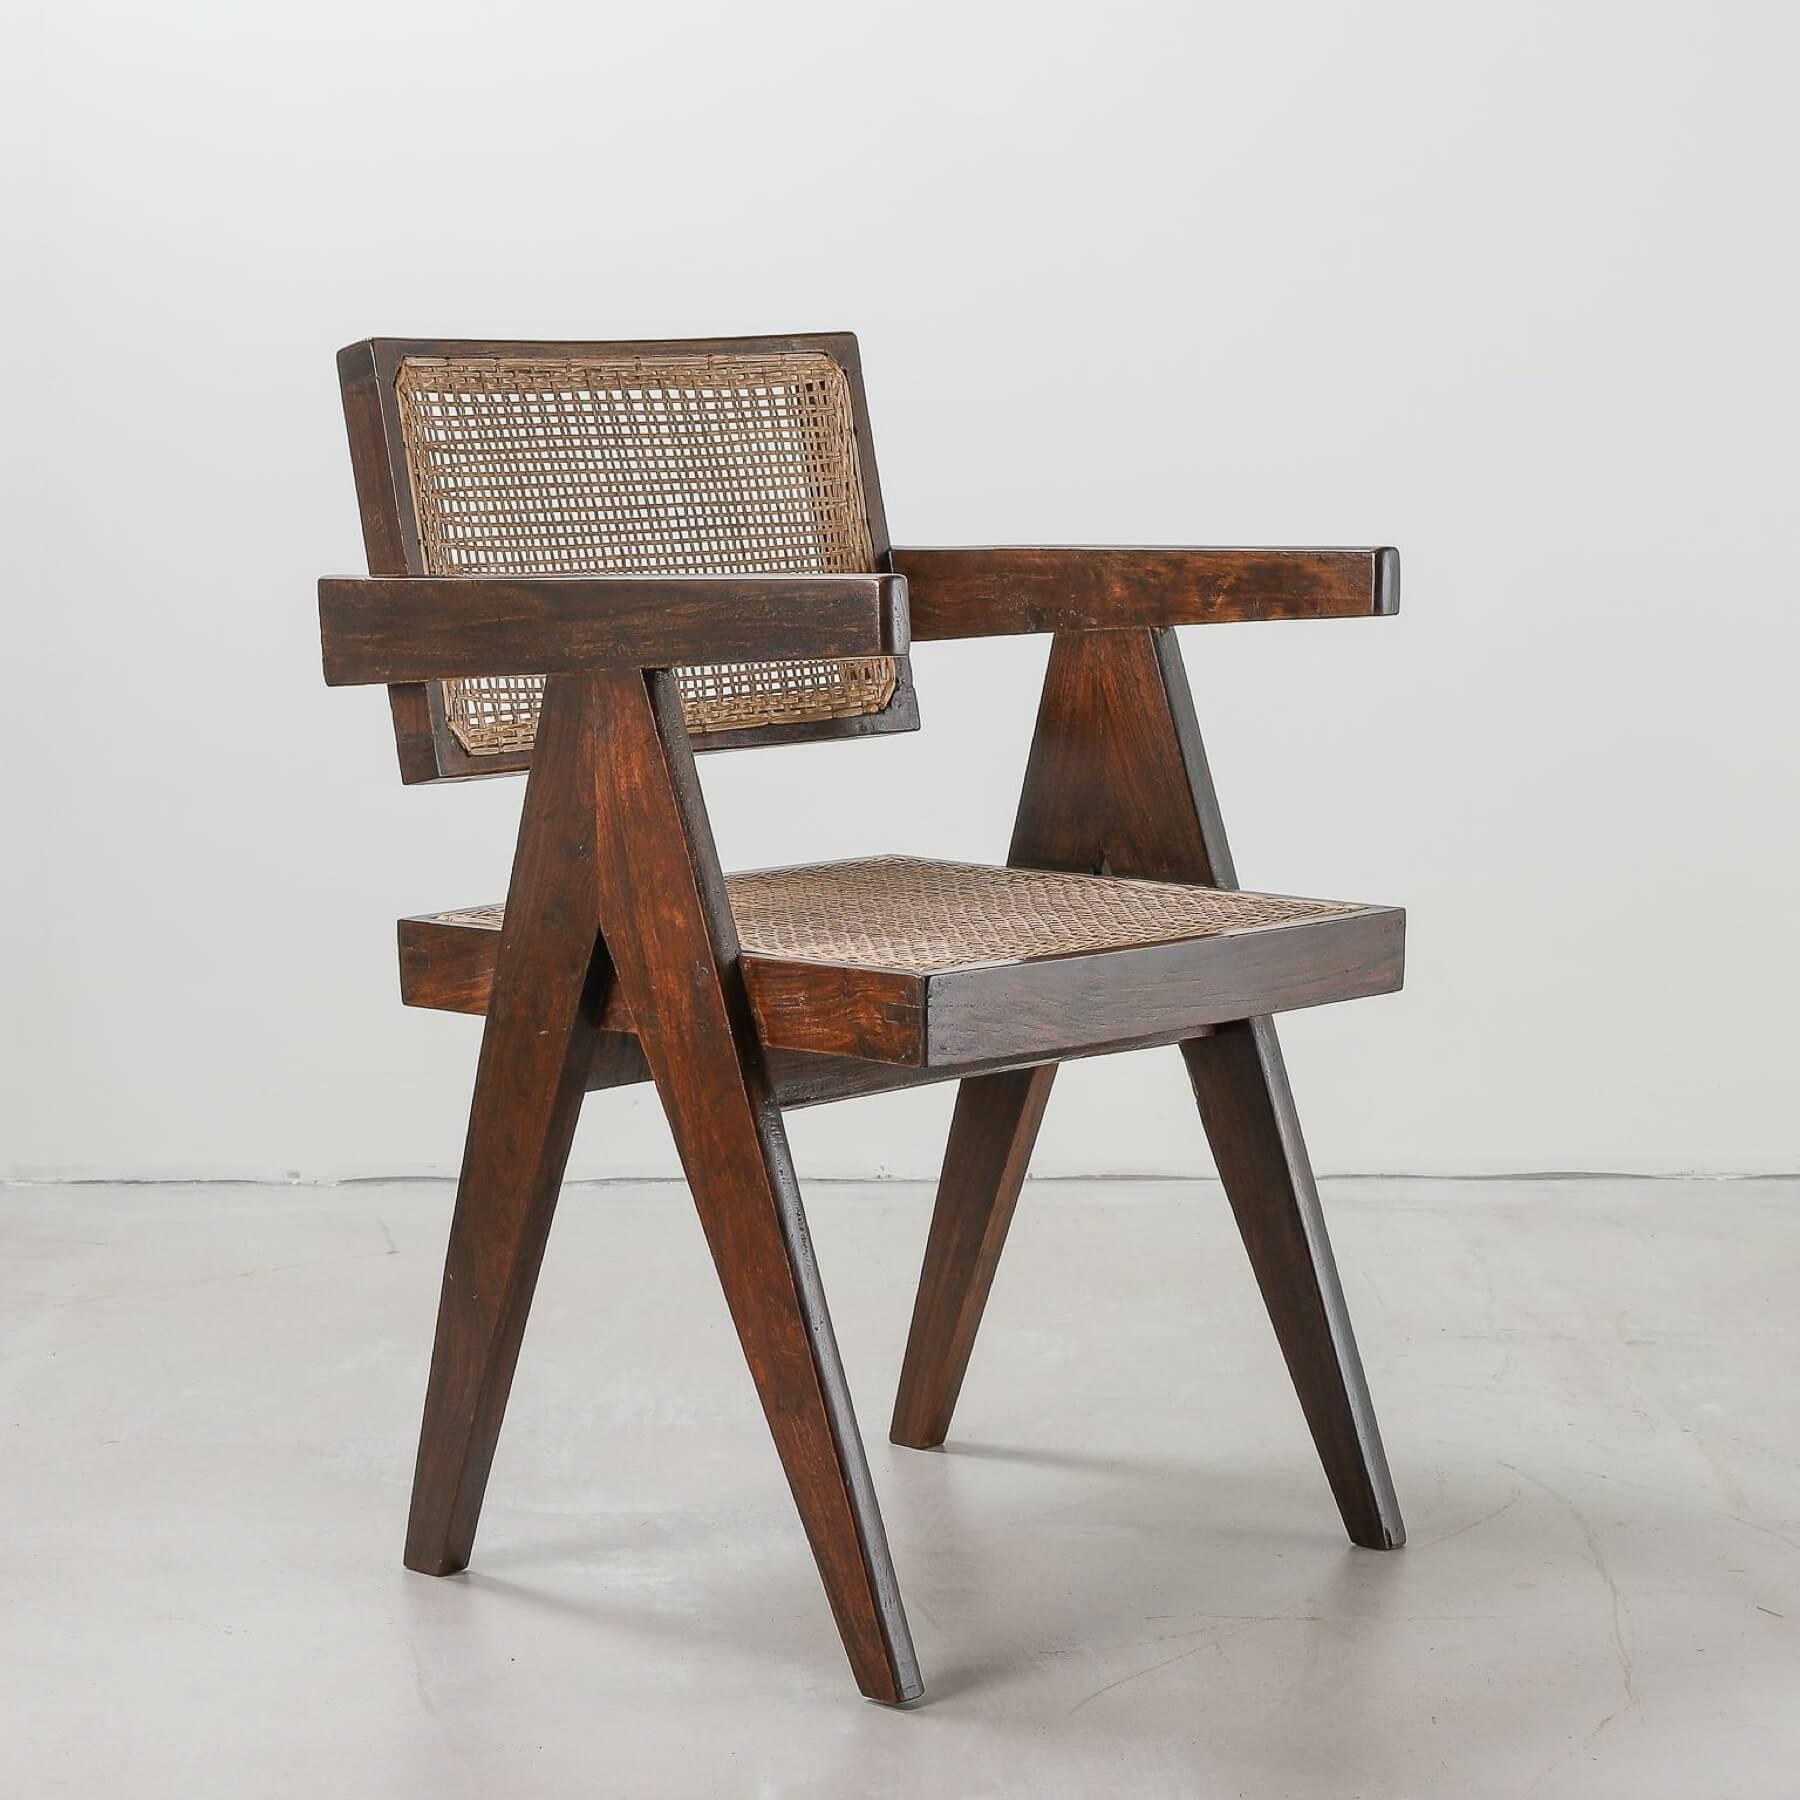 Original Pierre Jeanneret office chair